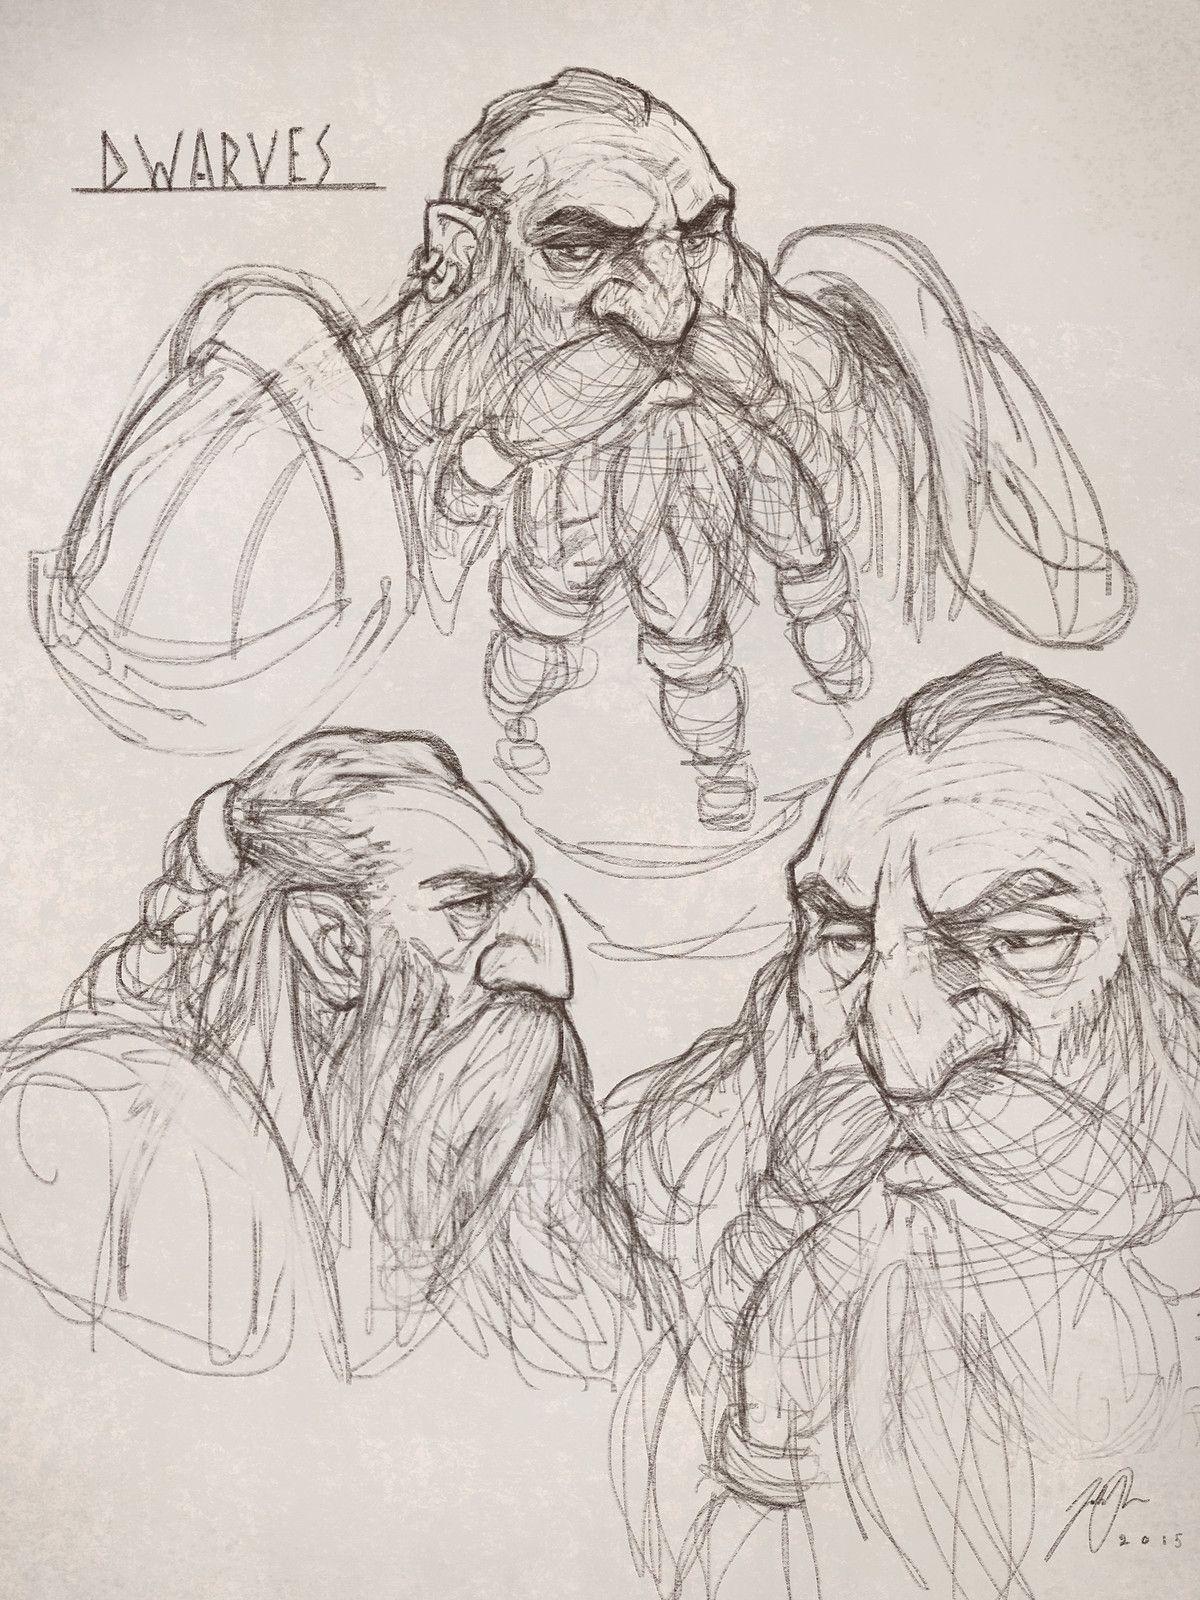 dwaervez, Johan Tidala on ArtStation at https://www.artstation.com/artwork/qow1e